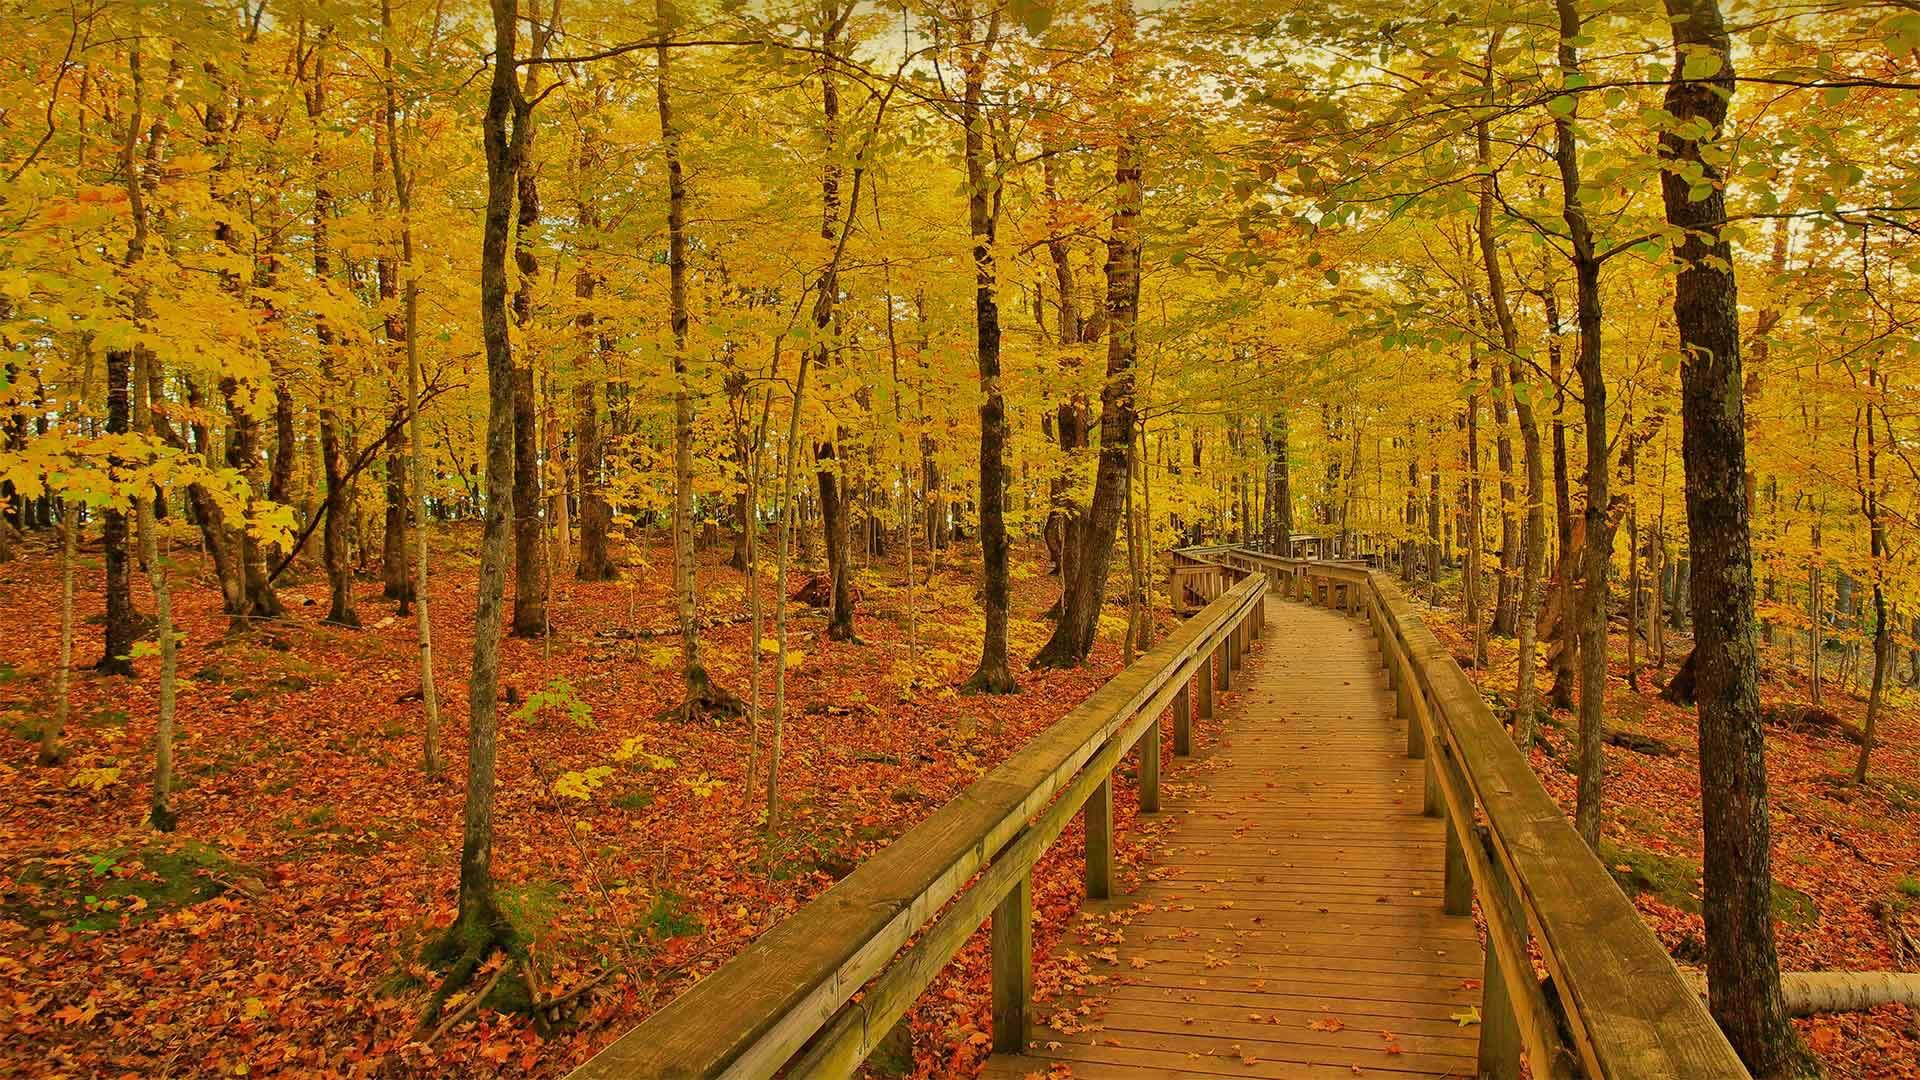 Escarpment Trail in Porcupine Mountains Wilderness State Park, Michigan (© Pat & Chuck Blackley/Alamy)